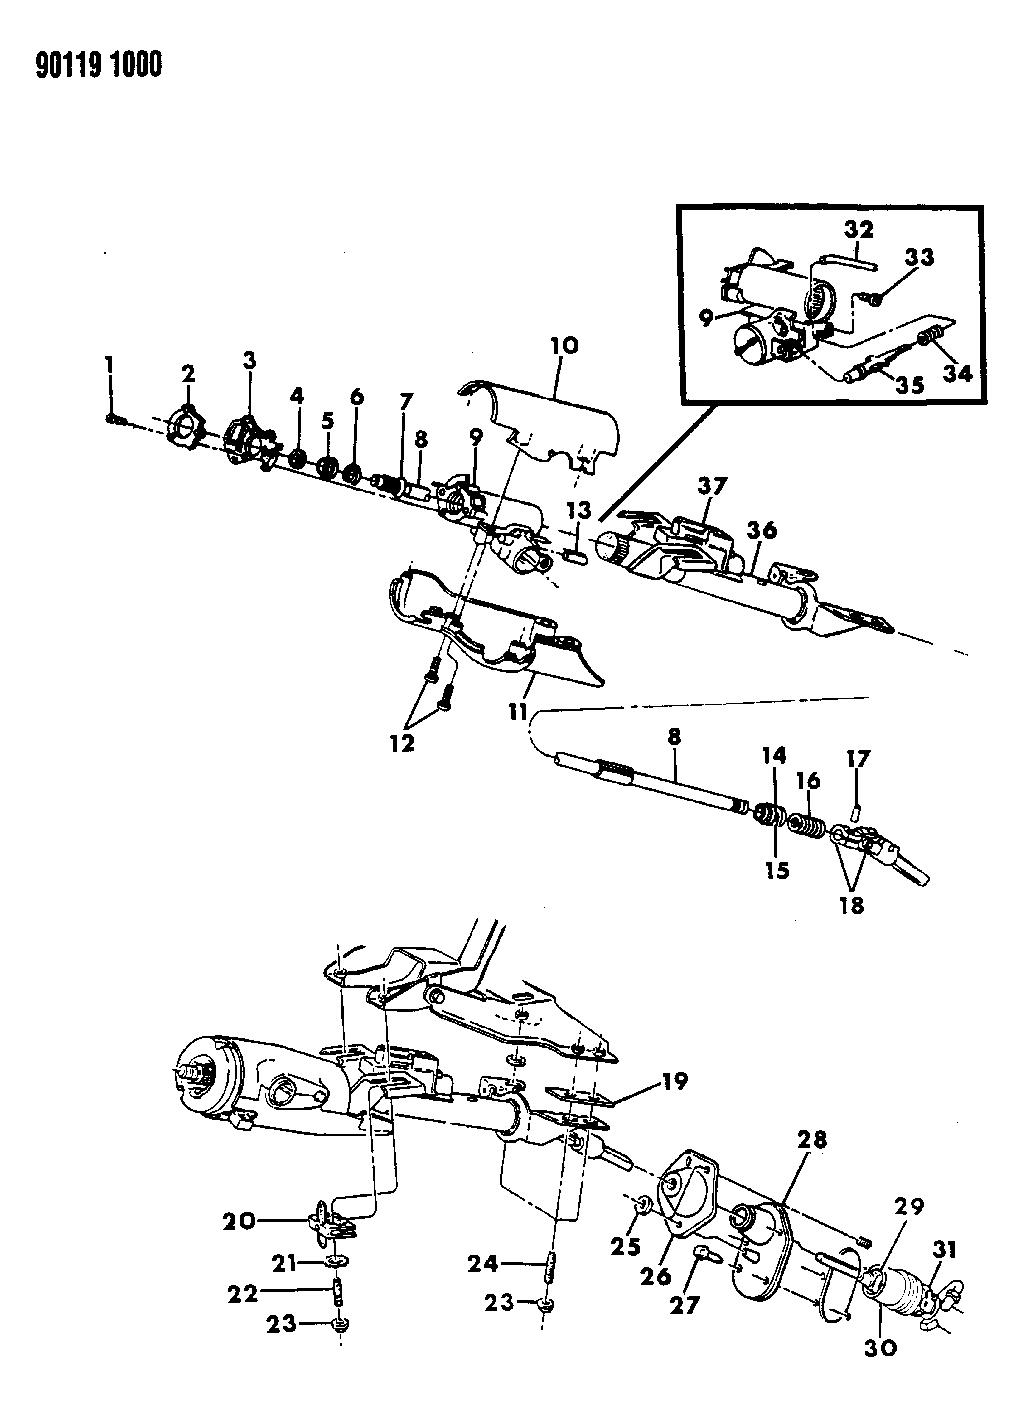 1990 Dodge Omni Column Steering Upper And Lower Wiring Diagram